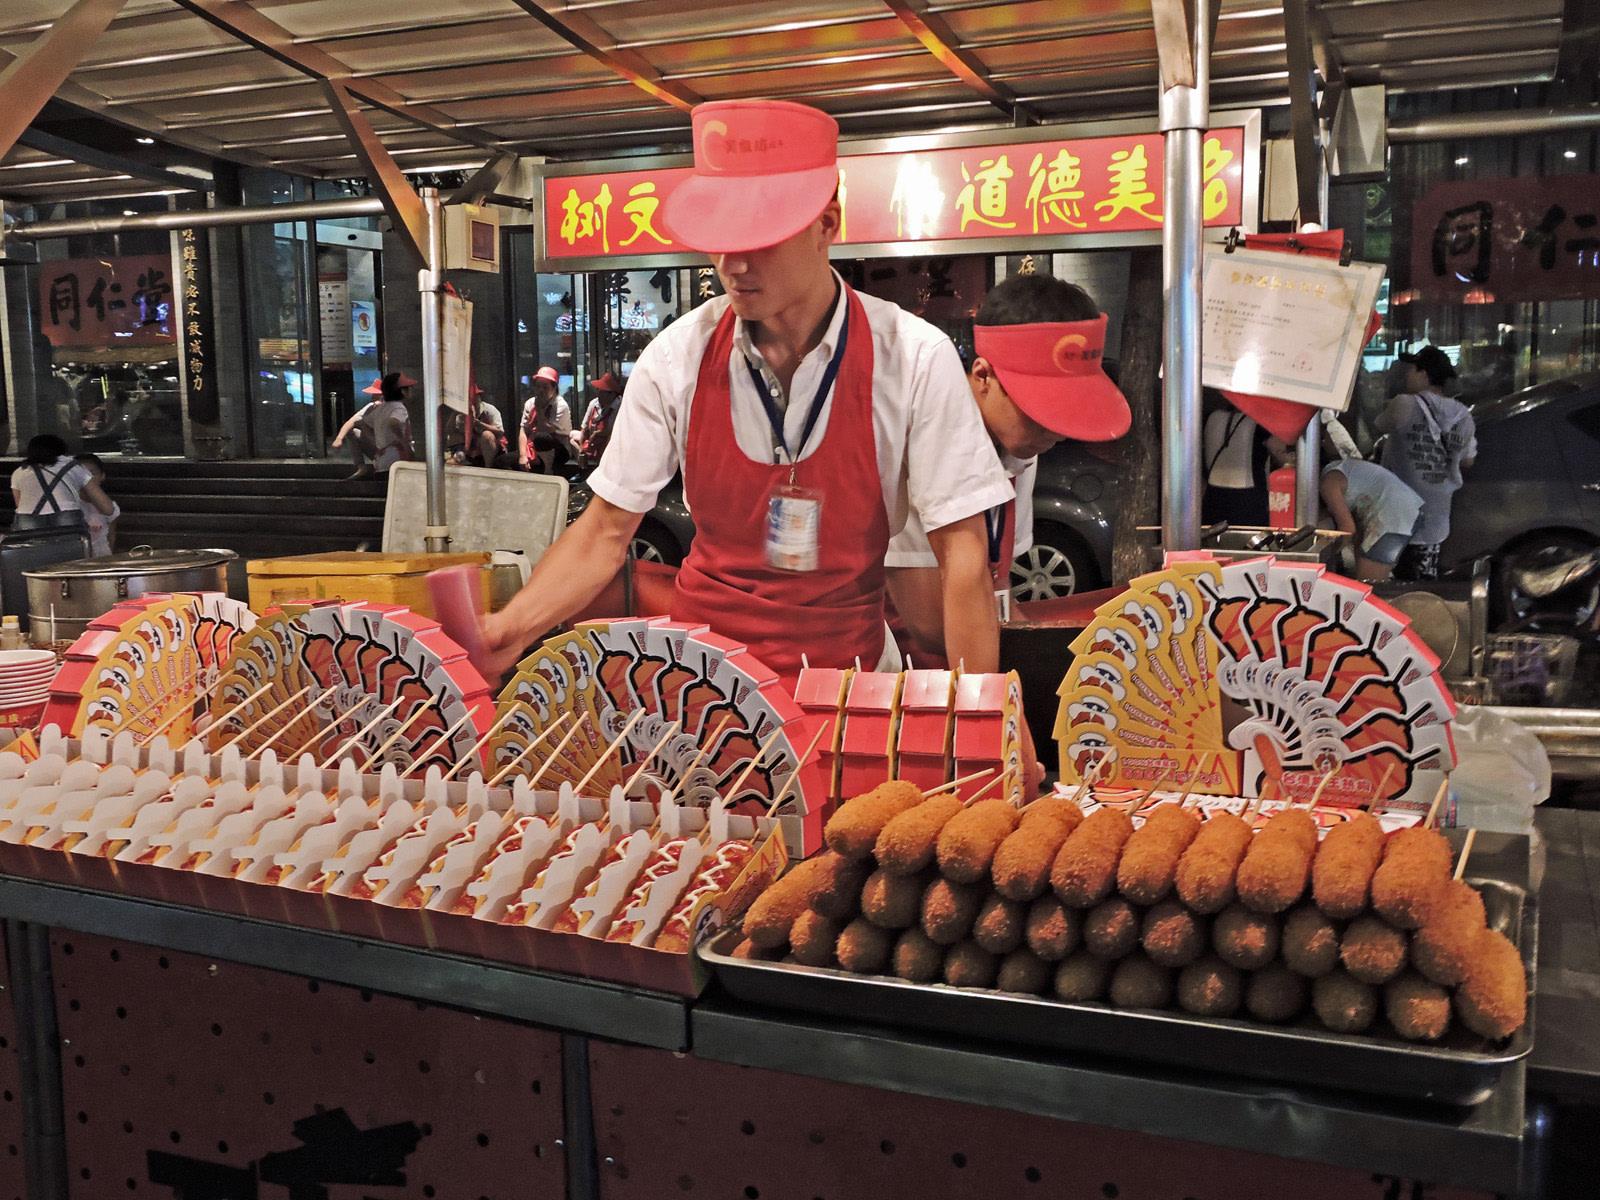 Donghuamen night market, Pechino, Cabiria Magni